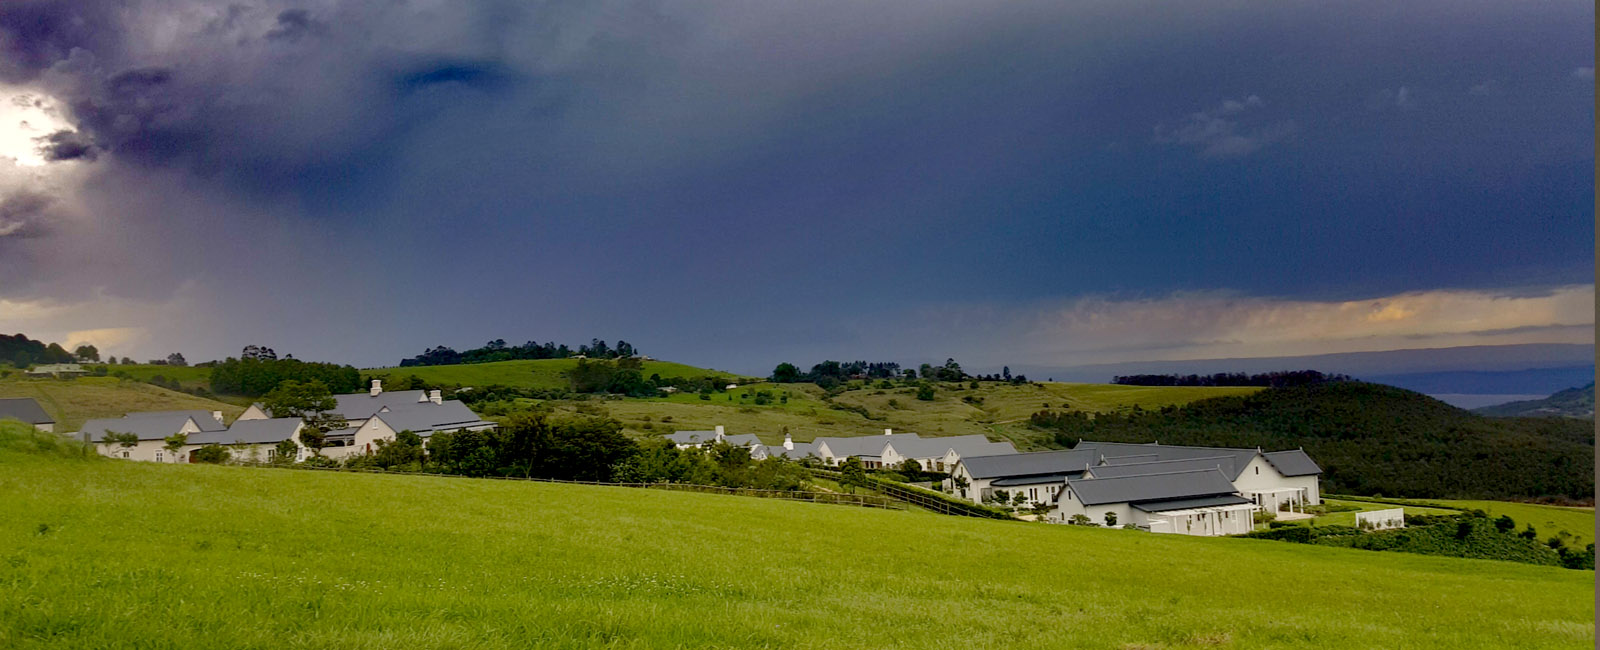 water-dam-beautiful-views-mountains-classy-stylish-premium-tennis-golf-garlington-estate-kzn-midlands-housing-countryside-country-farm-secure-hills